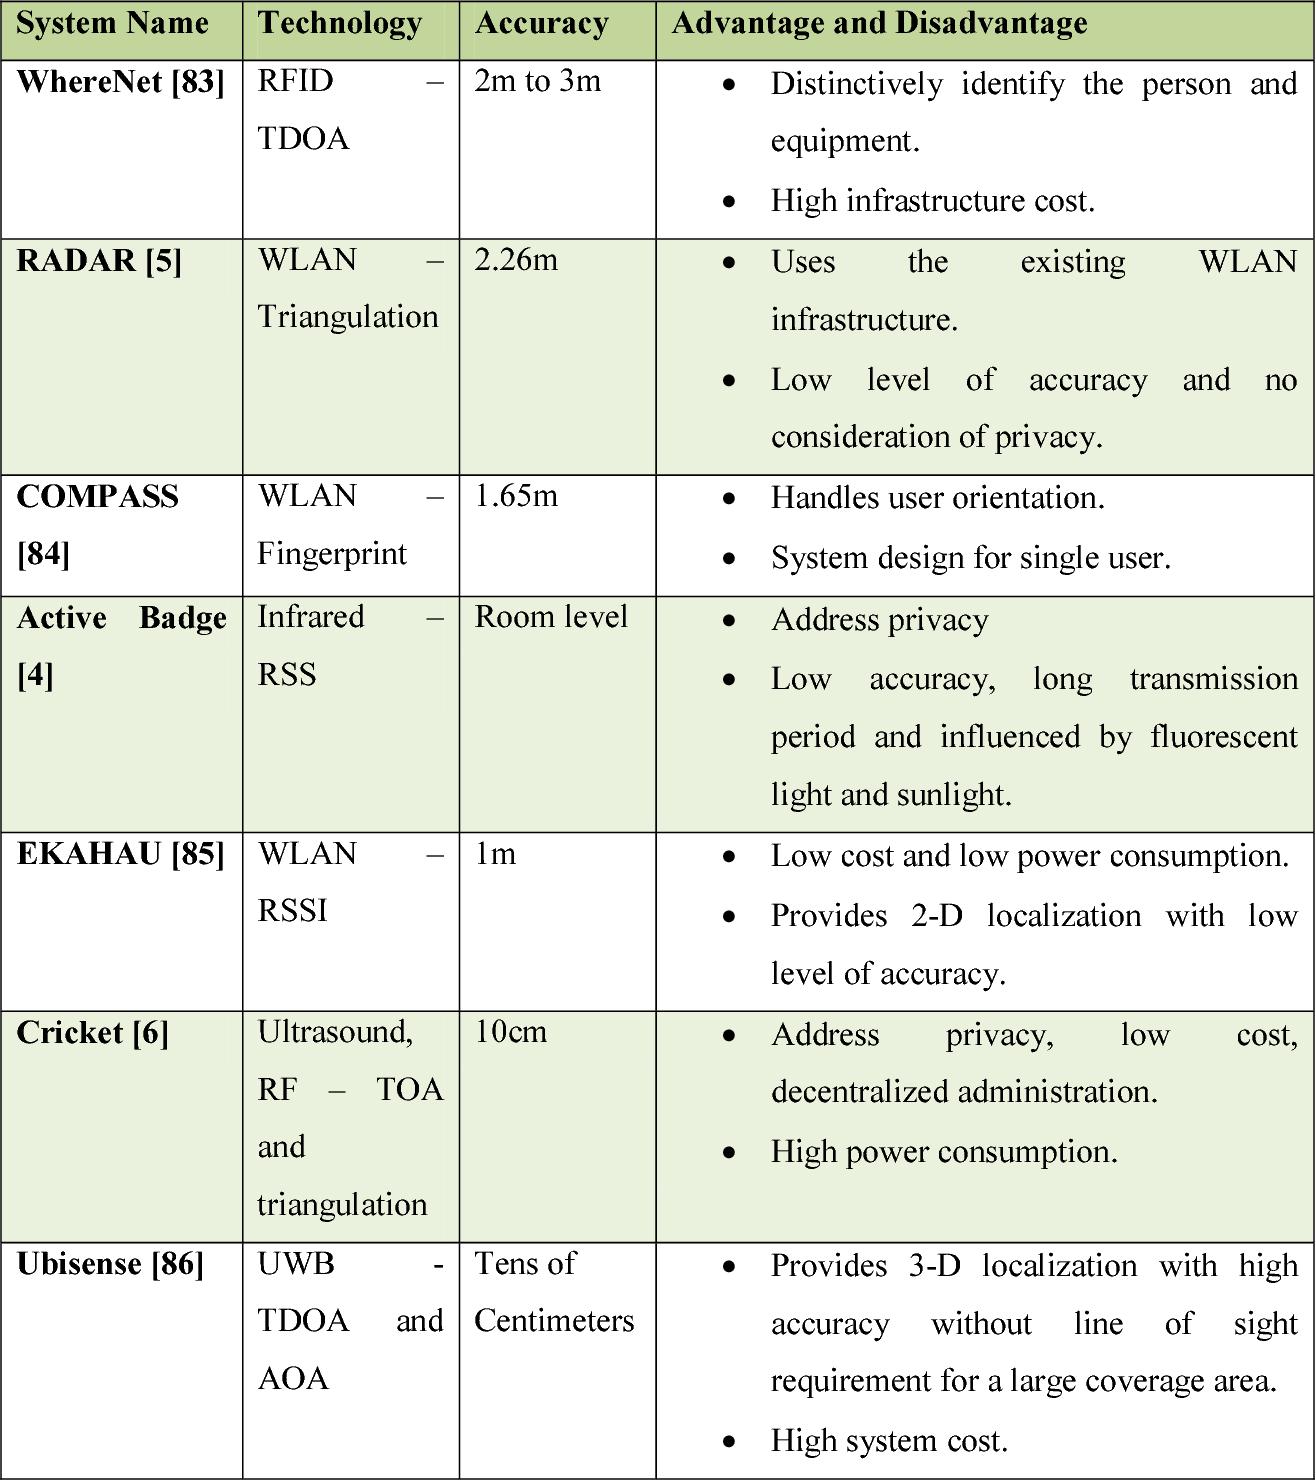 PDF] A HIGH-PRECISION INDOOR TRACKING SYSTEM by Ishar - Semantic Scholar